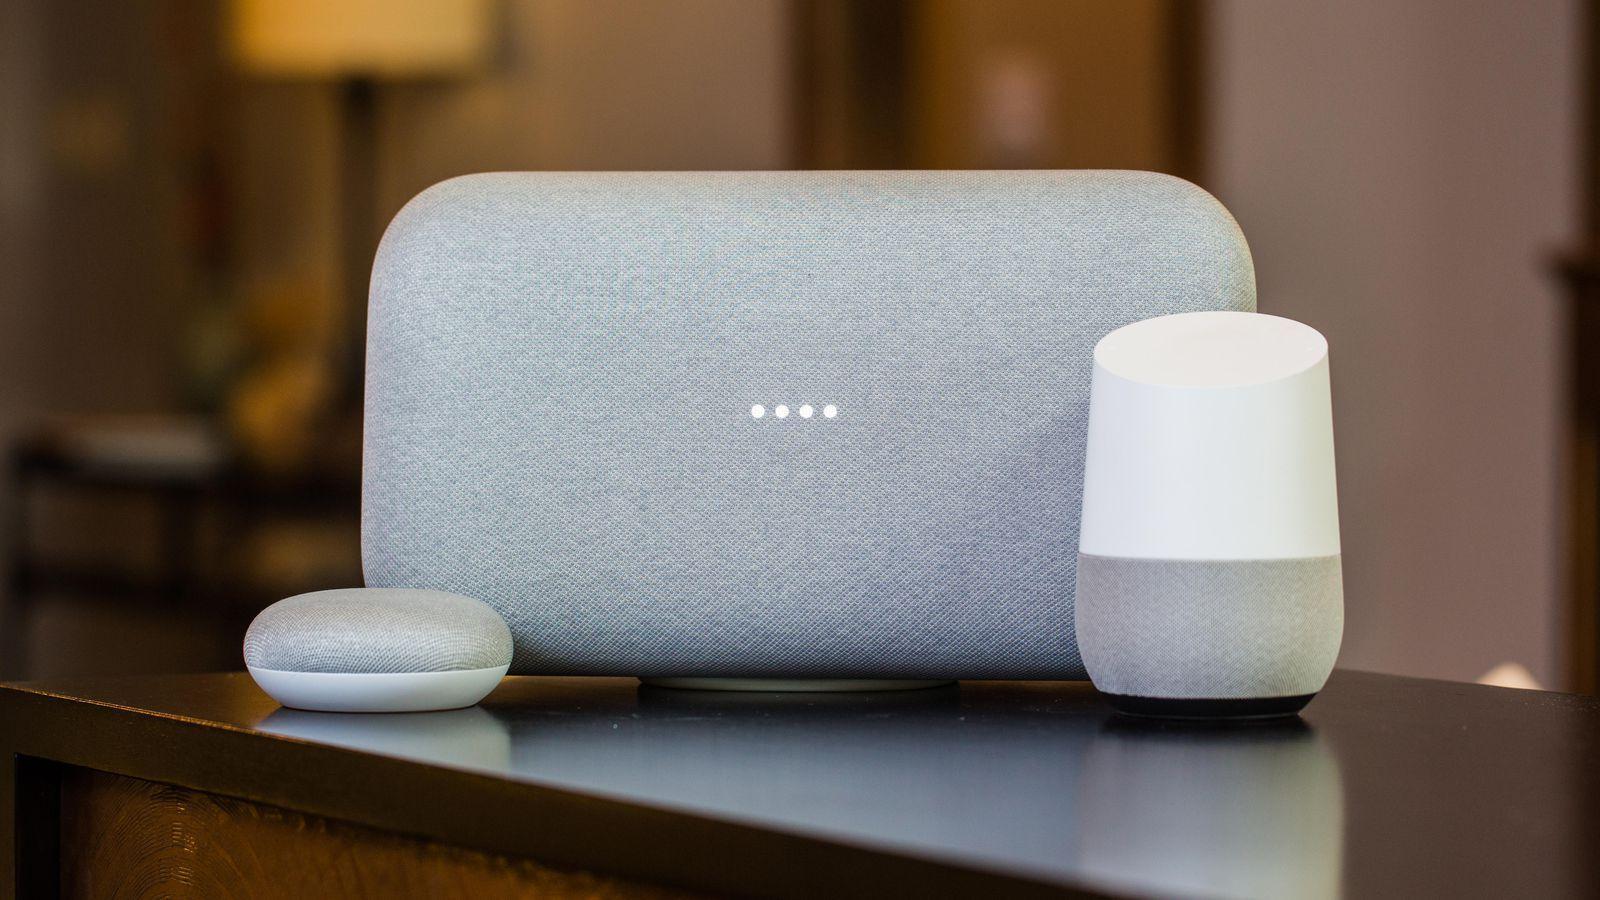 Google Home con Google Assistant